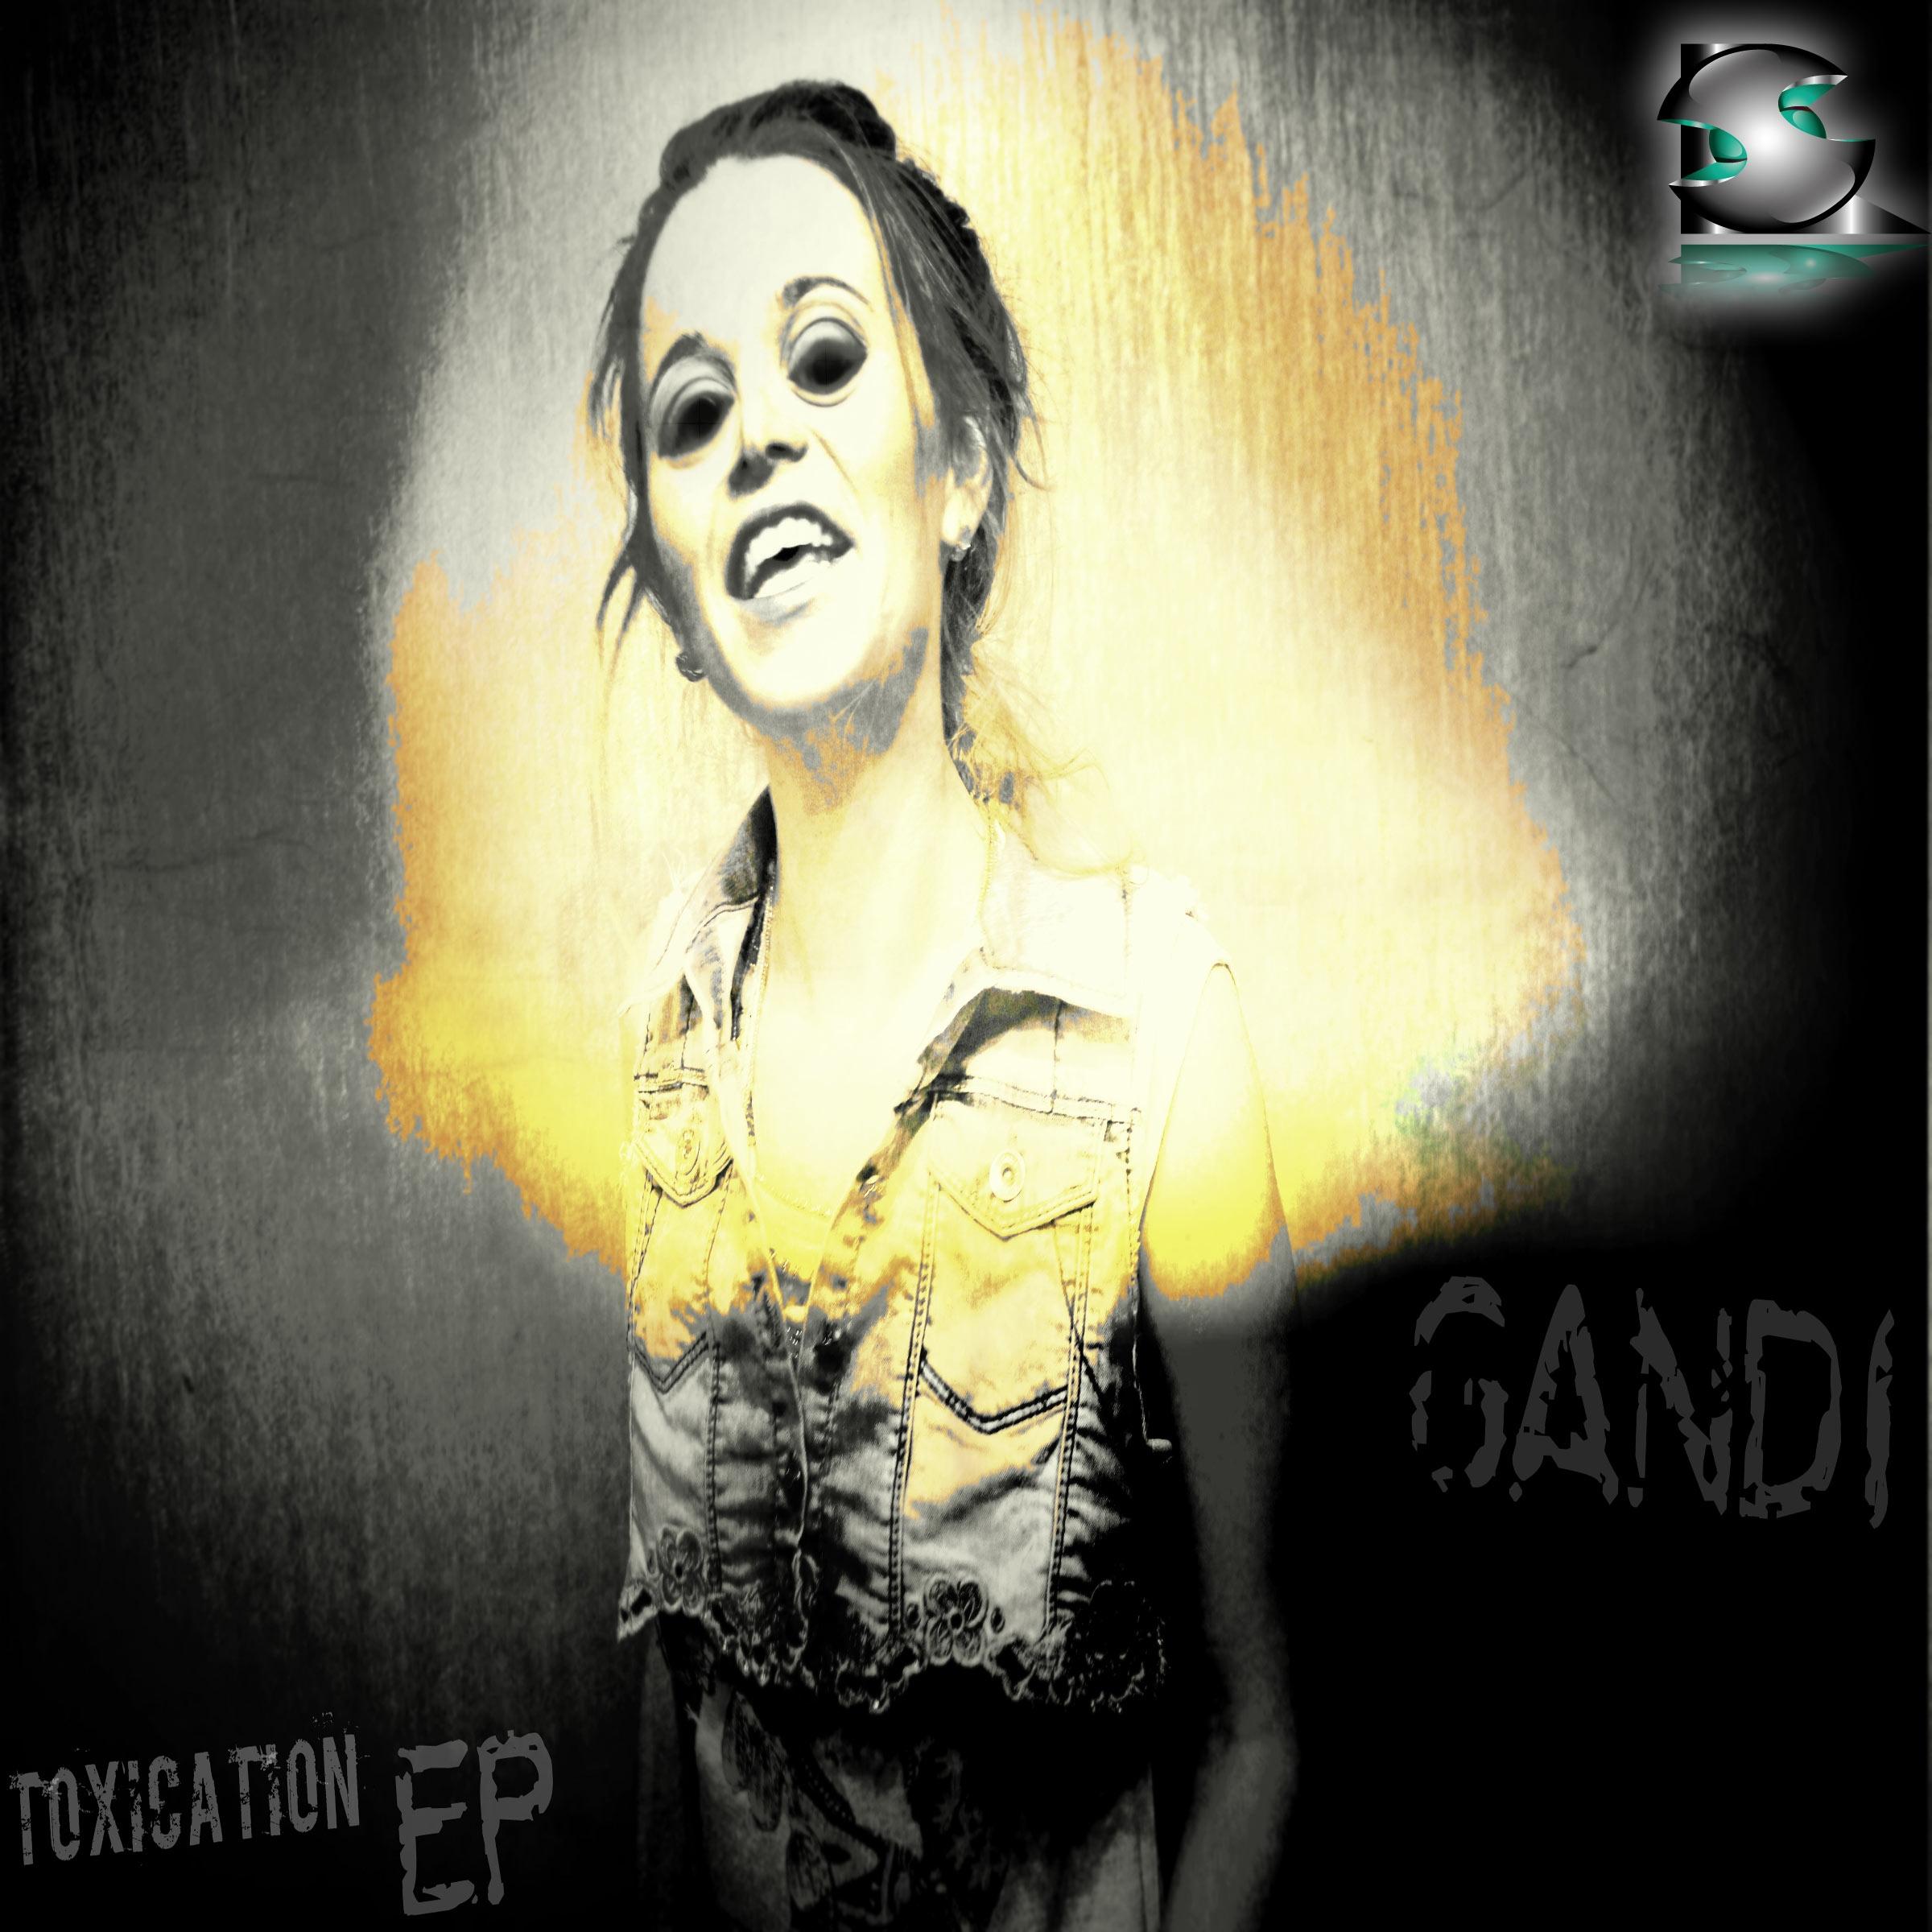 GANDI - Grace (Original mix)